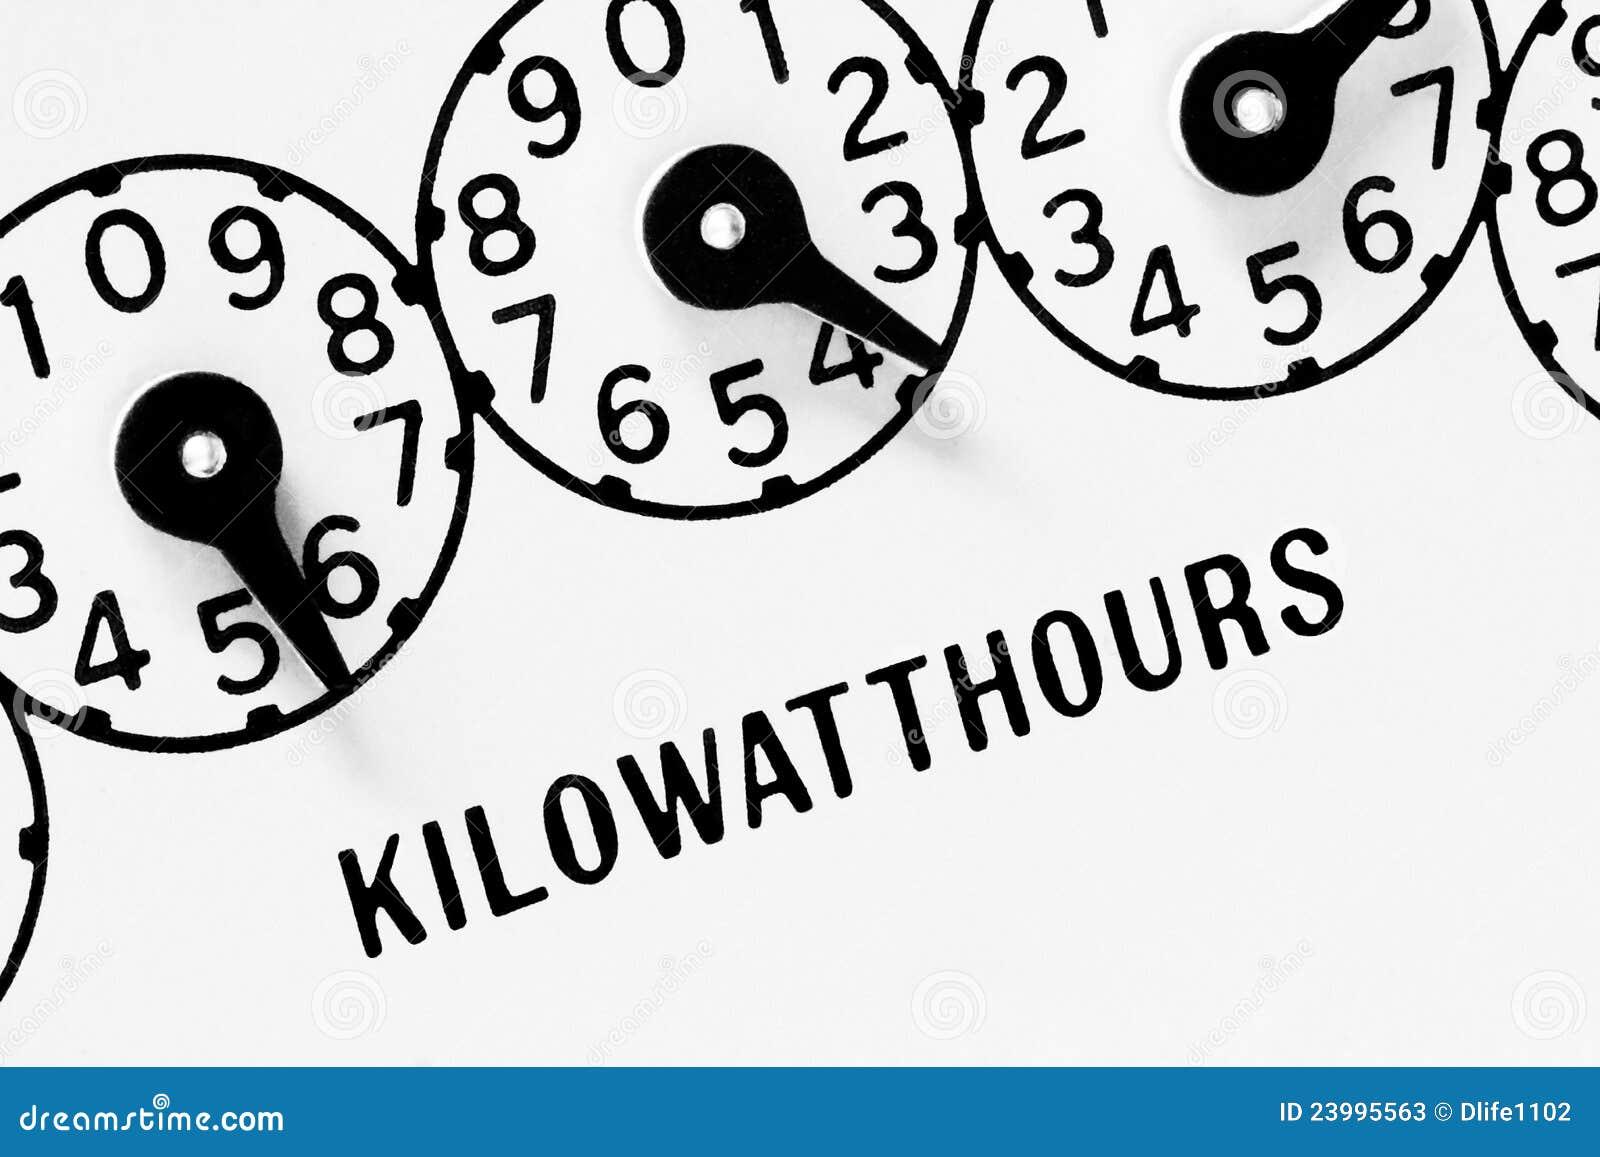 electric meter dials stock image  image of metering  bills